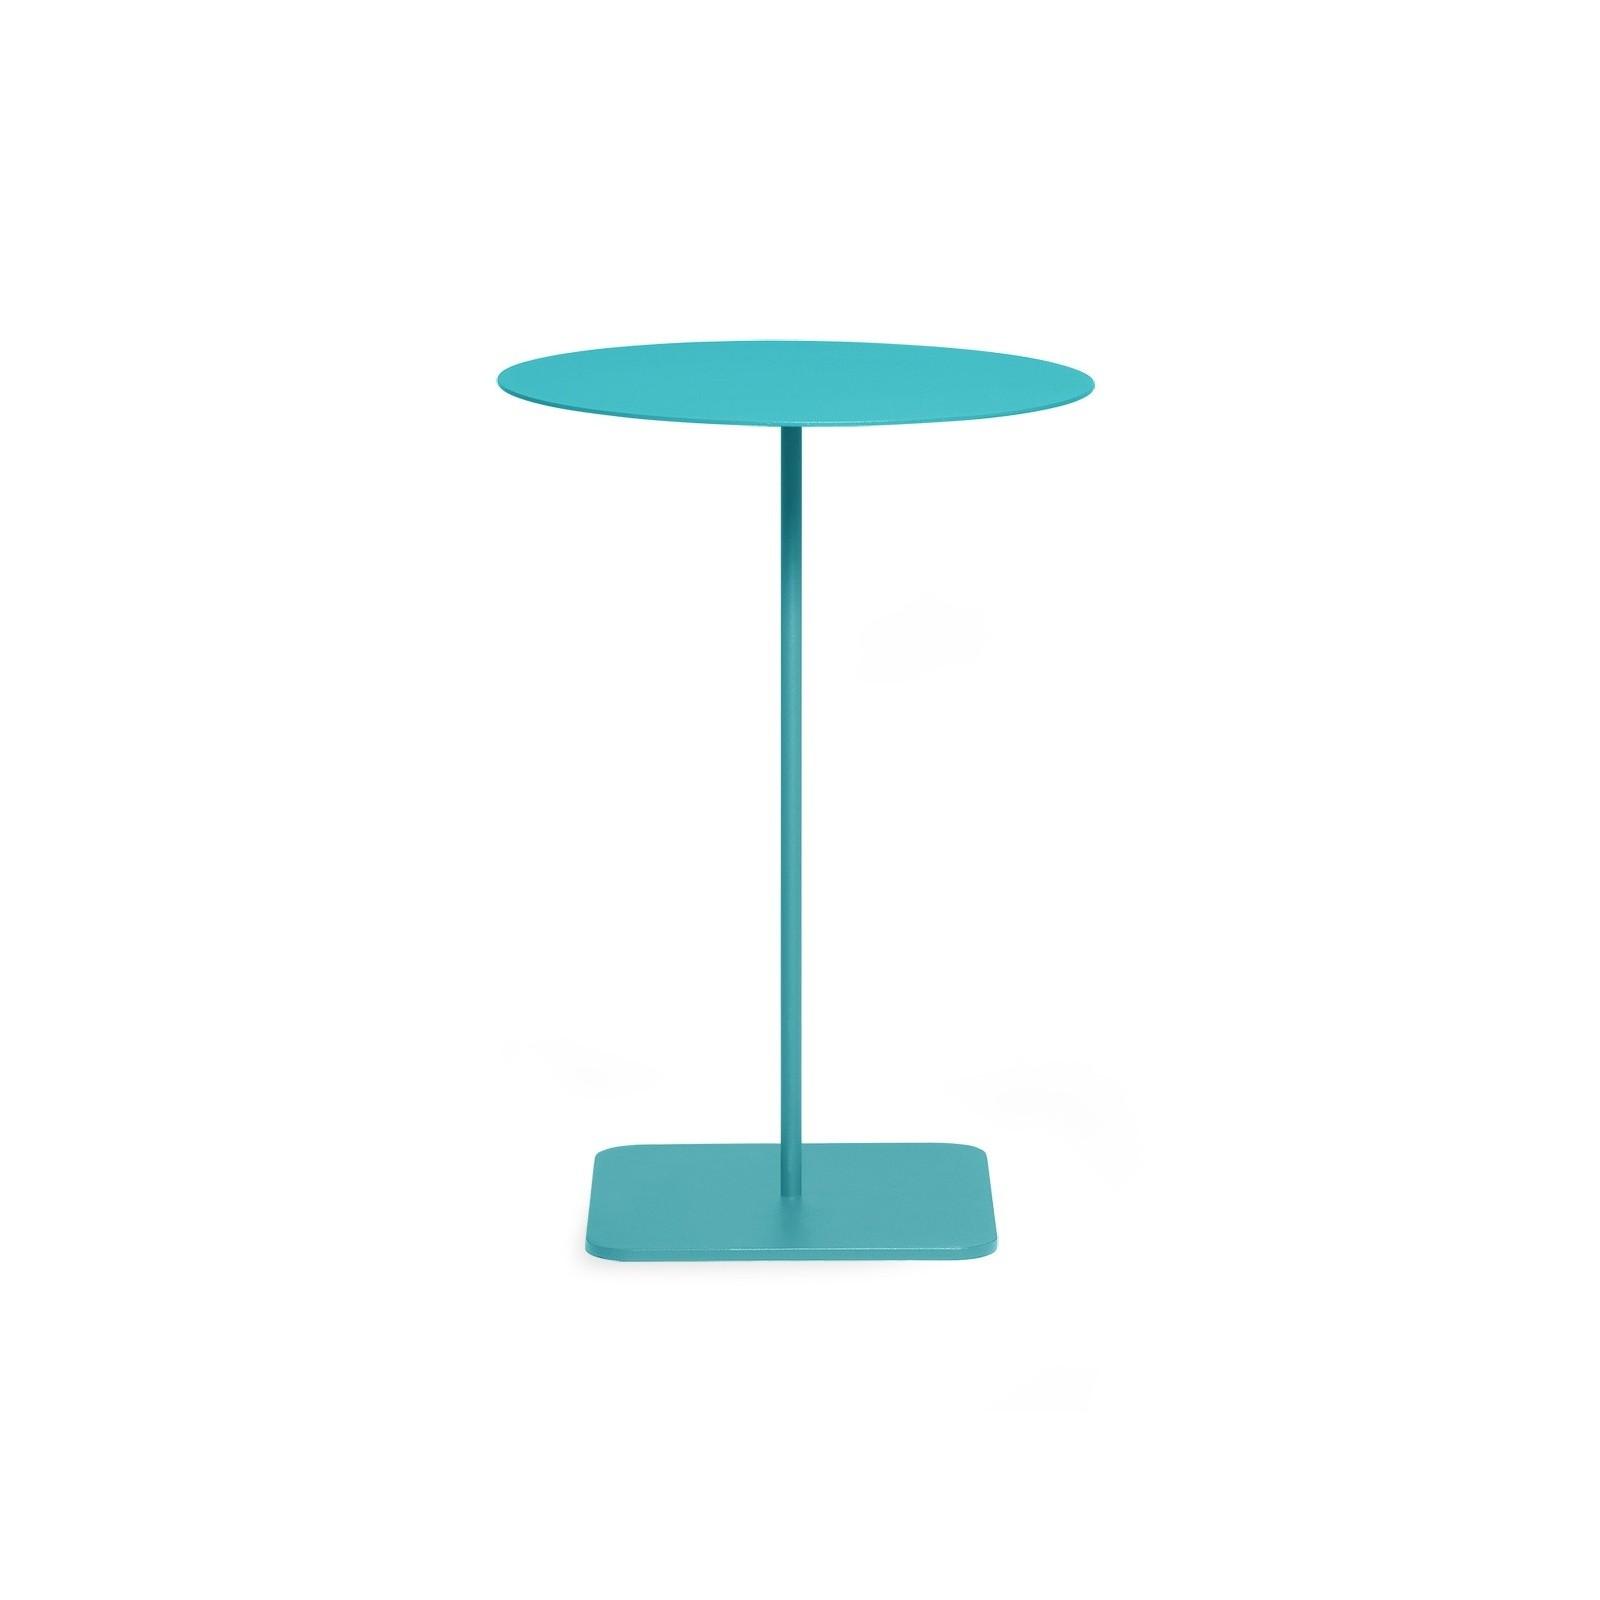 Mesita coffee table - 57 - blue